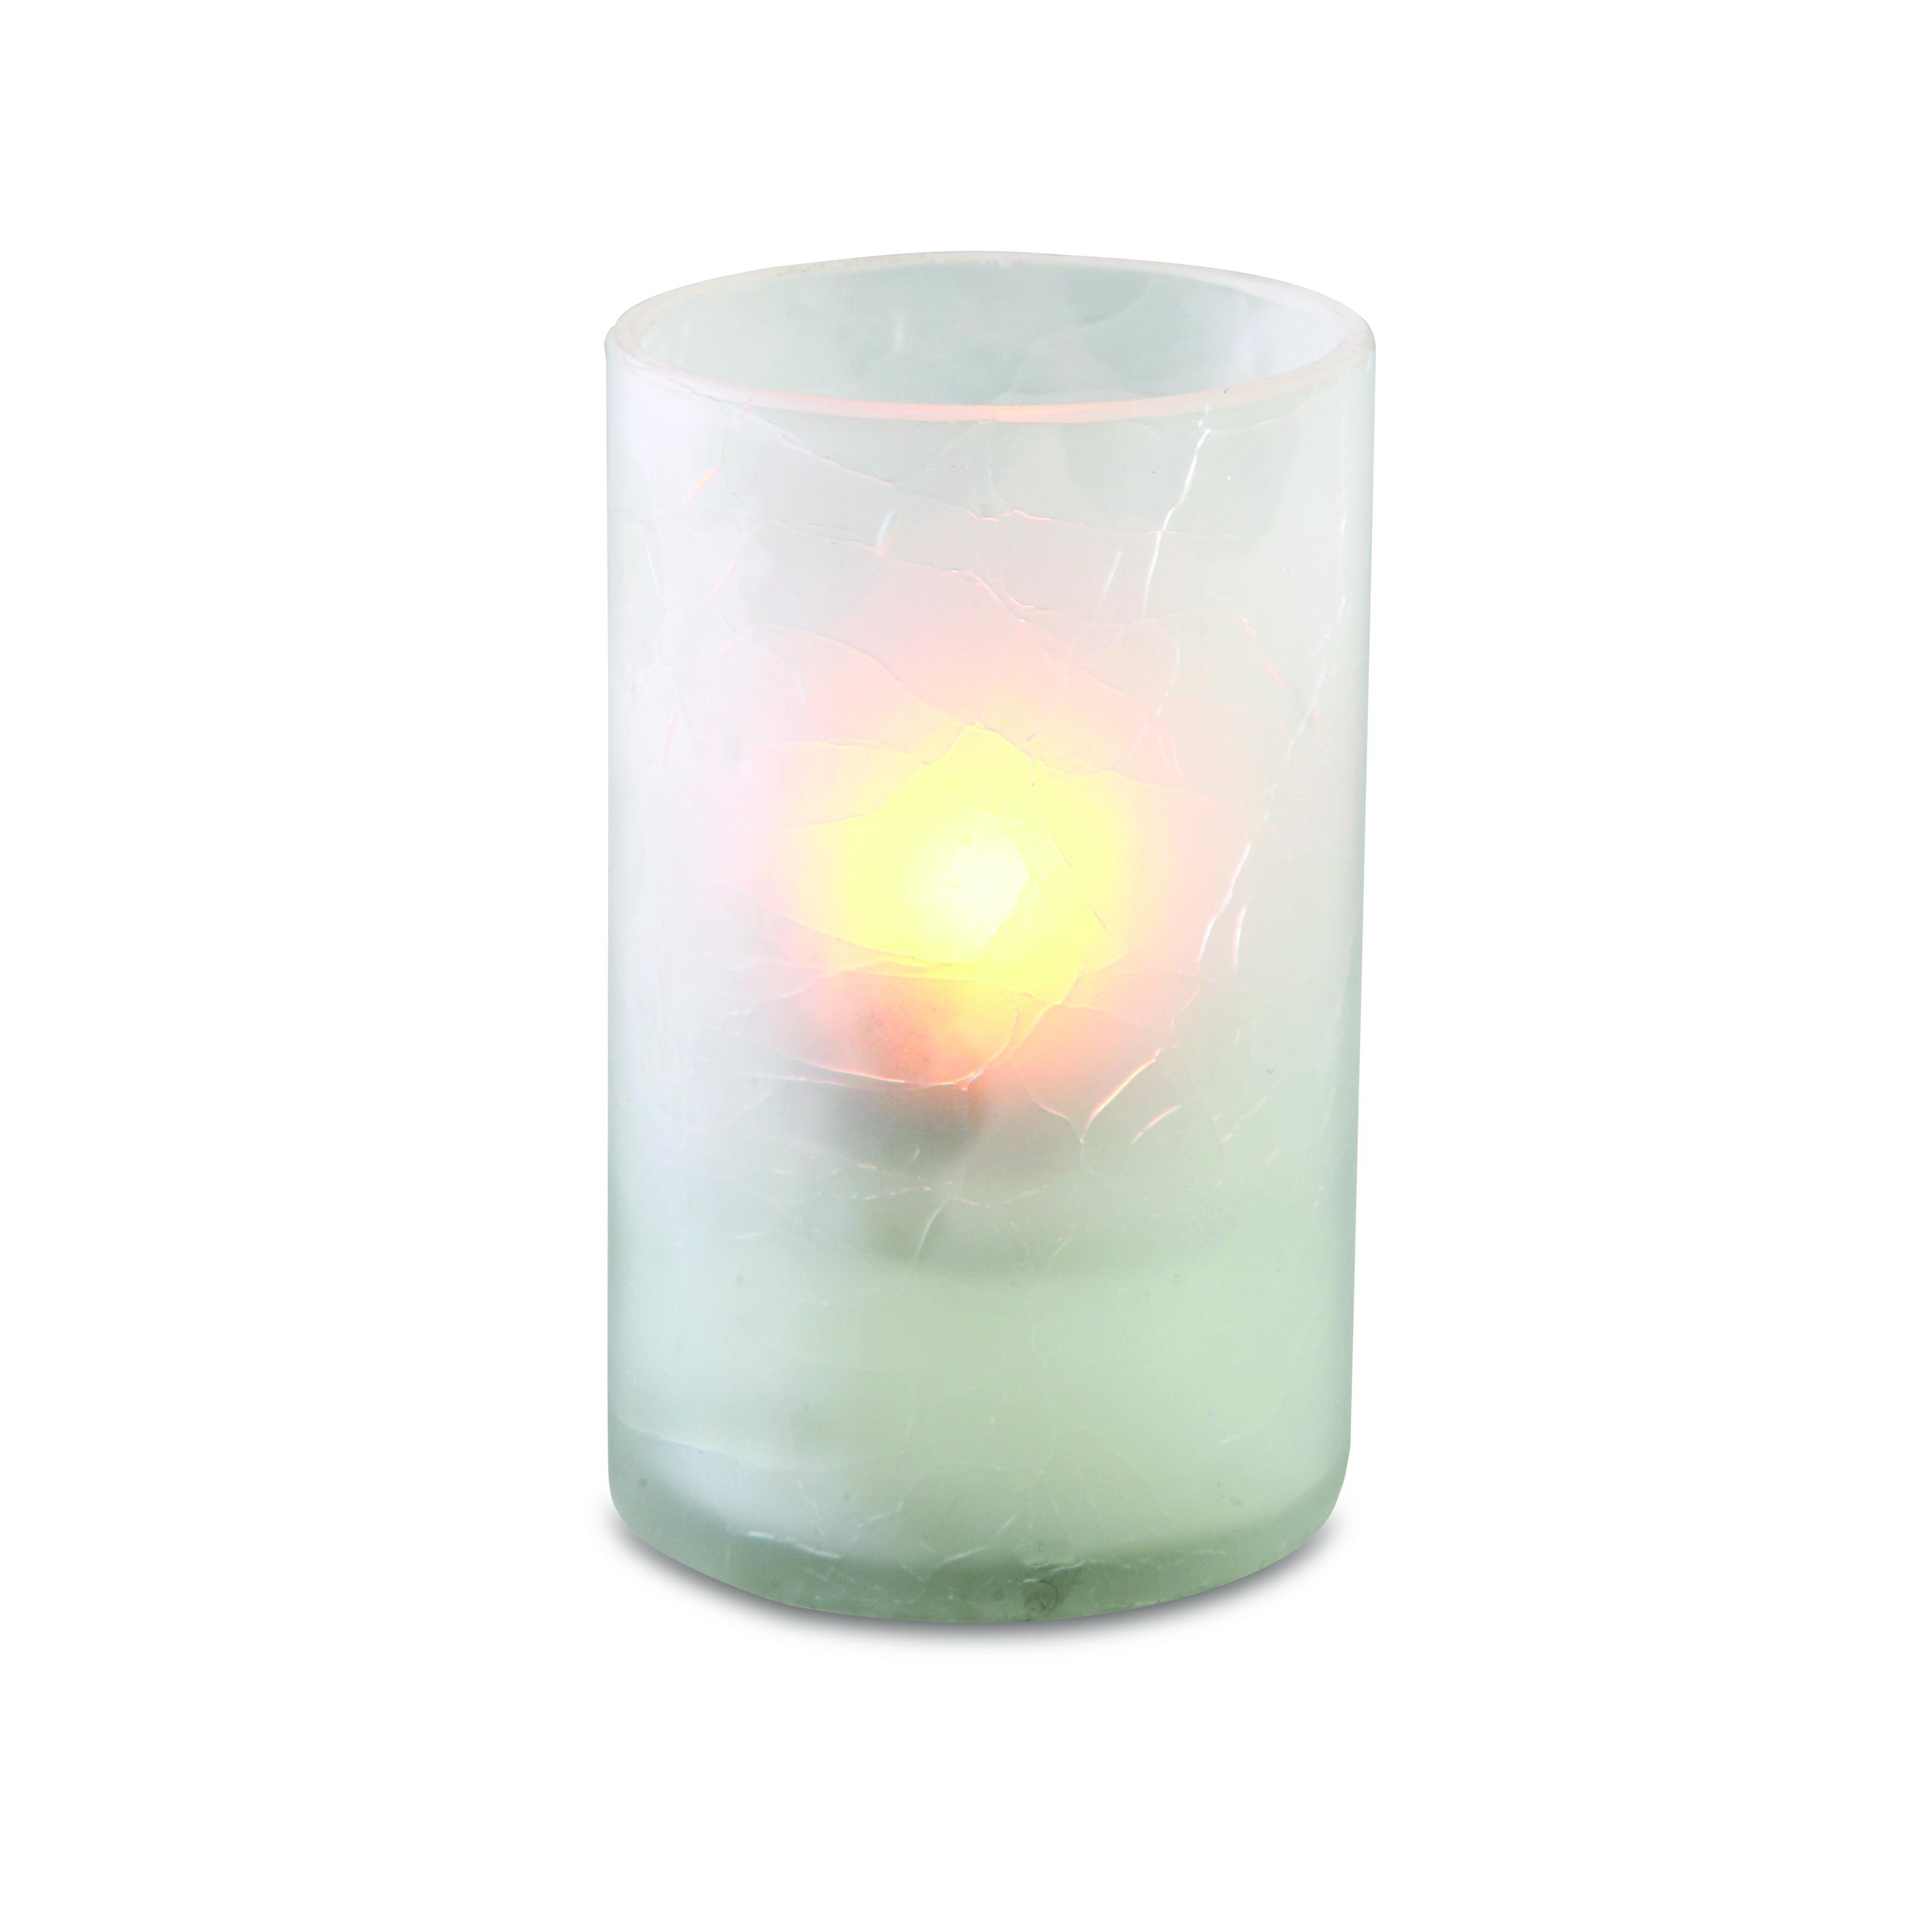 Sterno 80278 lamp